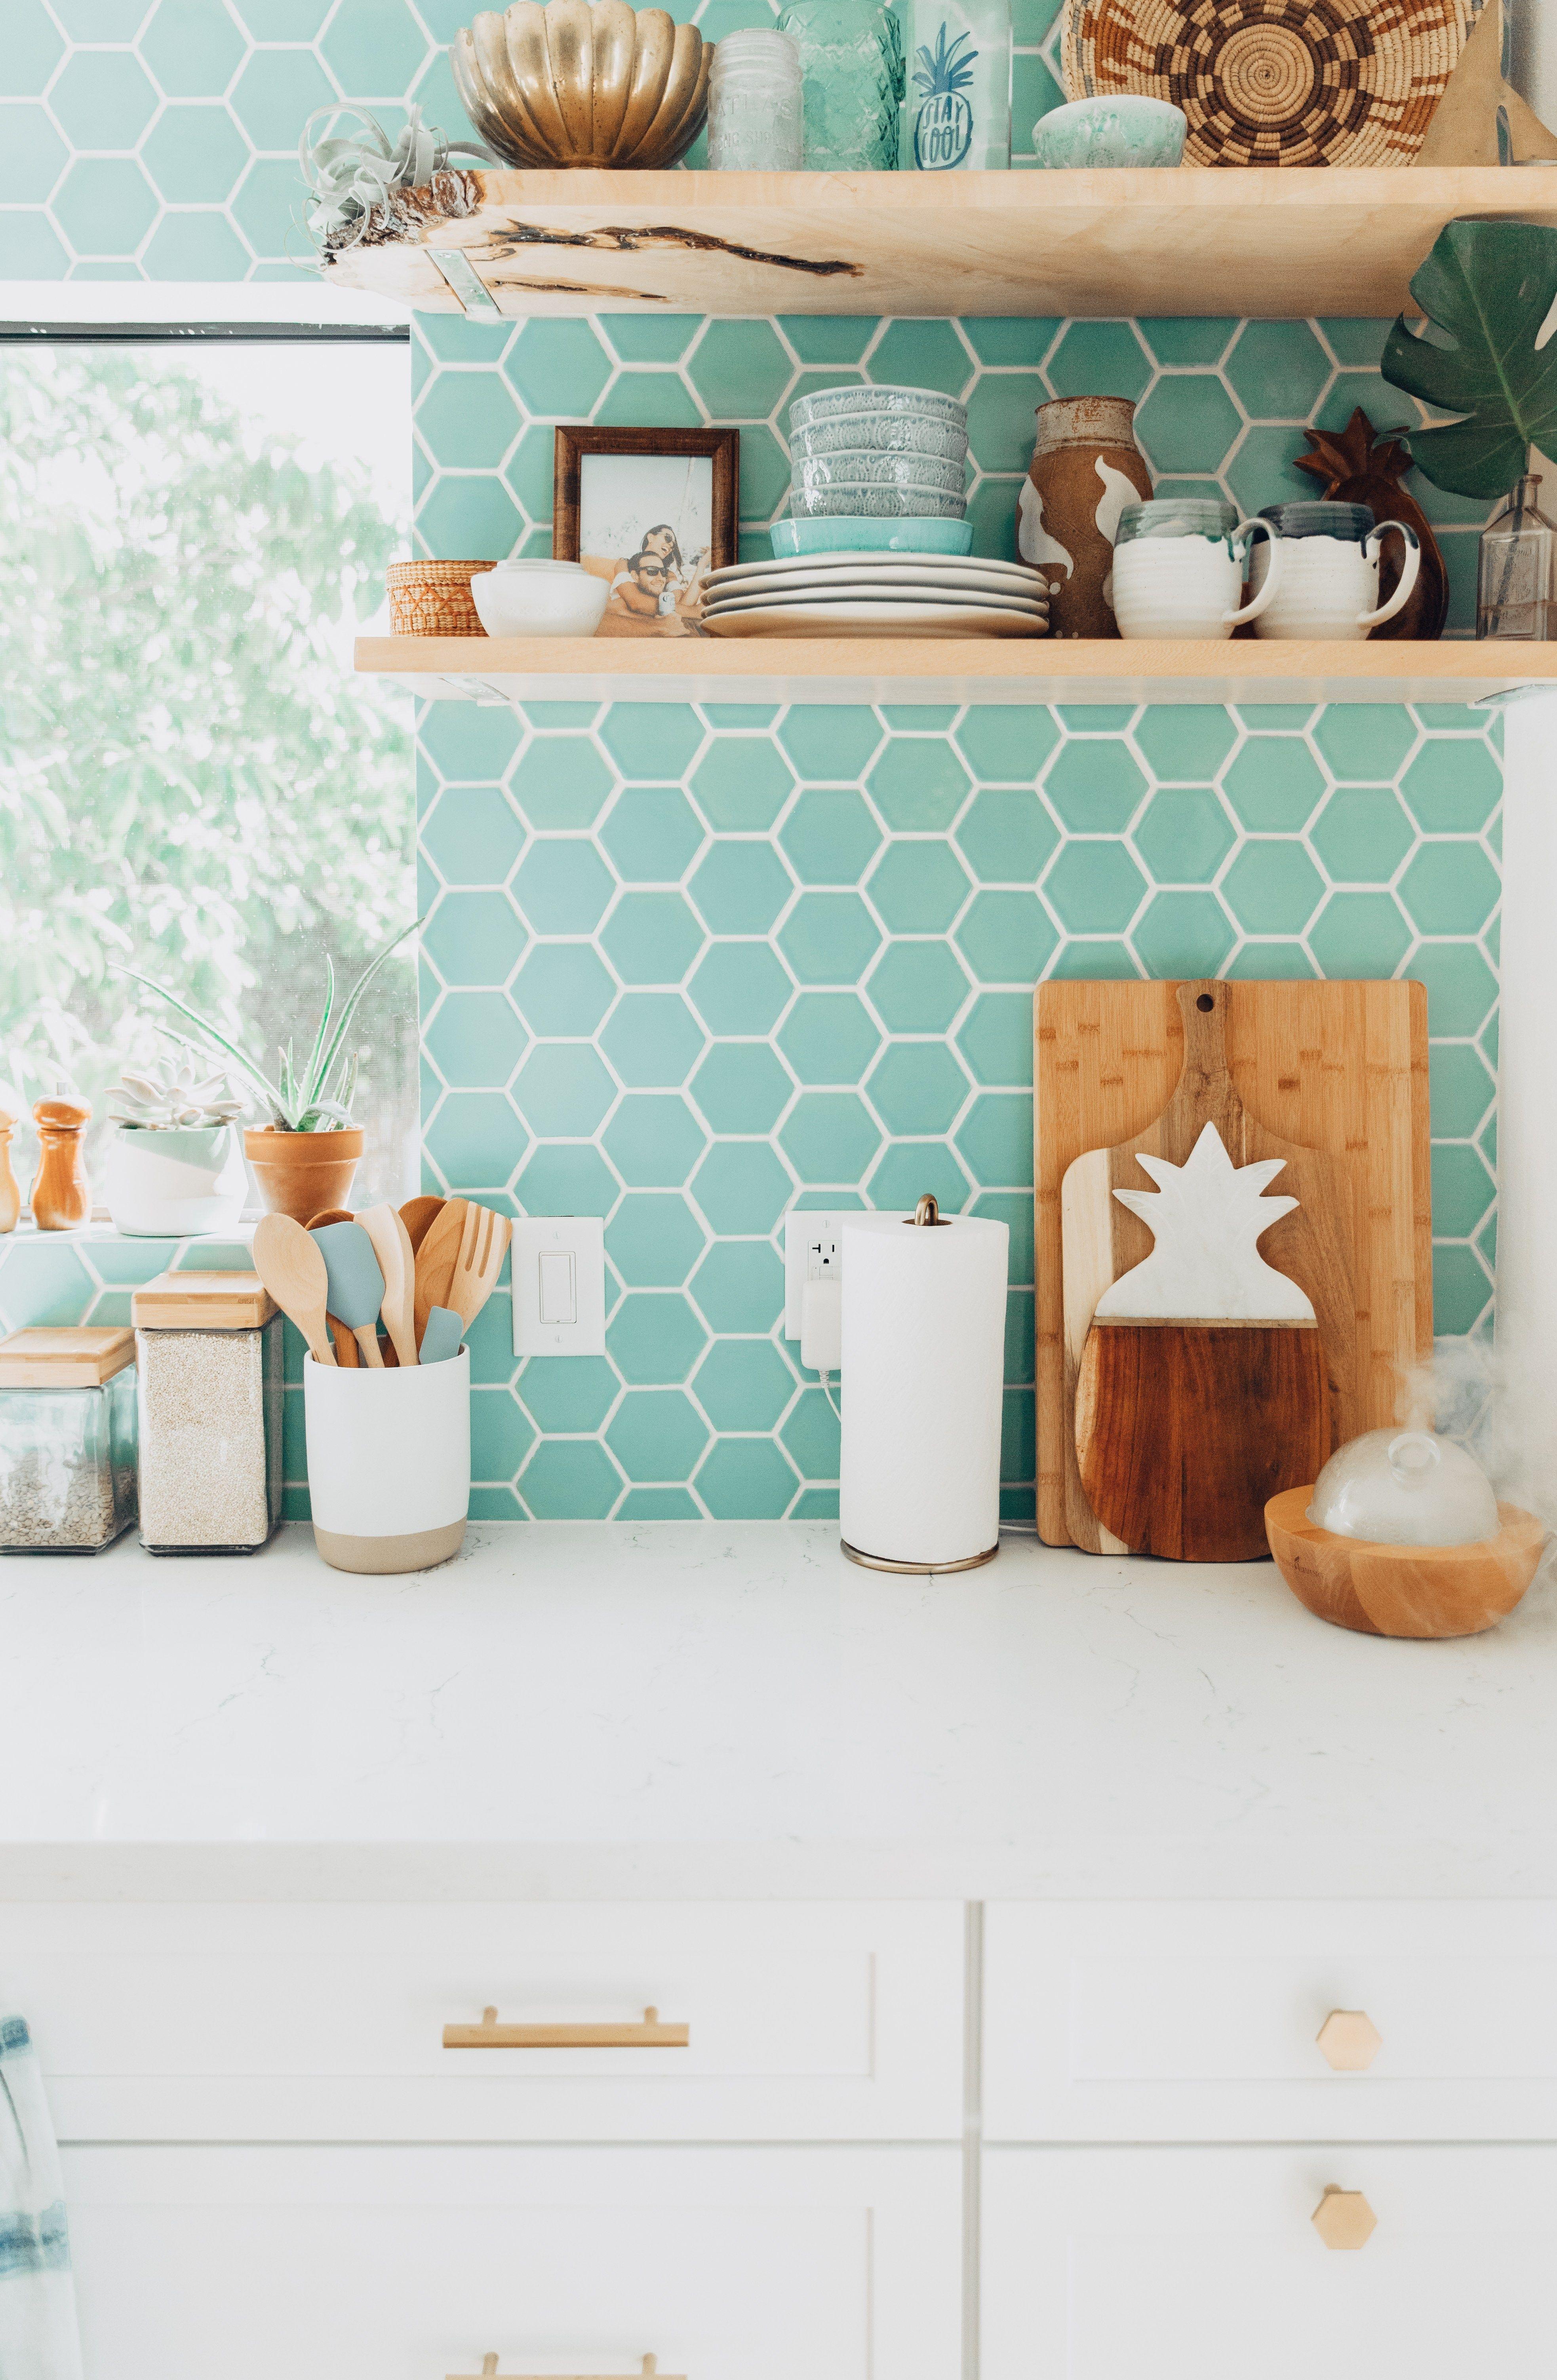 Our Kitchen Renovation Reveal Tropical Modern Bohemian Green Kitchen Backsplash Kitchen Remodeling Projects Bold Kitchen